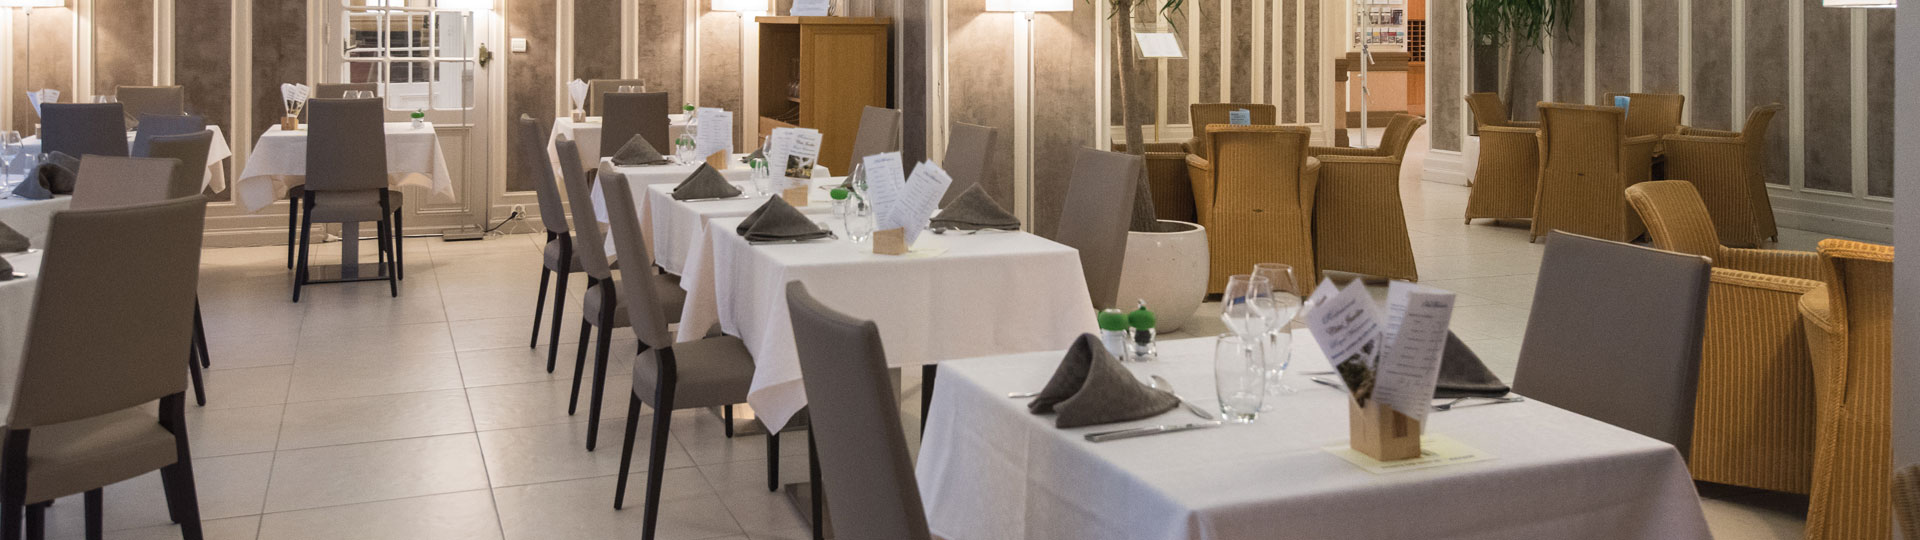 Restaurant Côté Jardin - Hôtel Royal Westminster